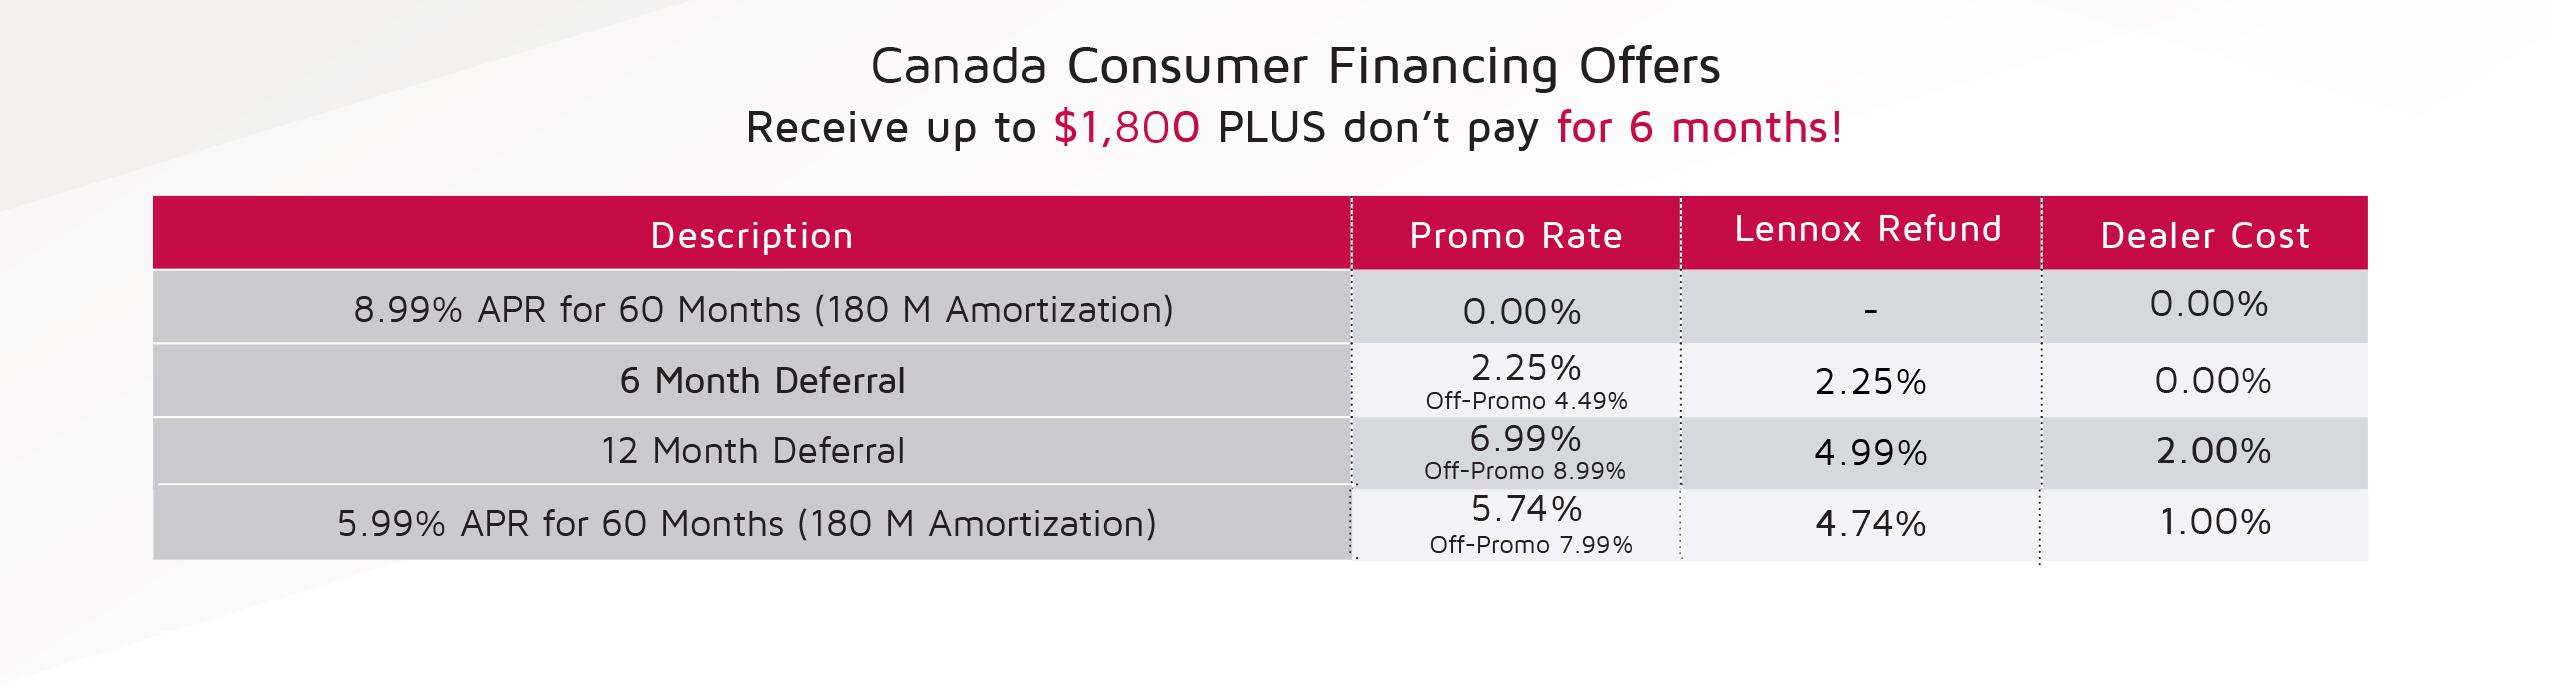 Canada Consumer Financing